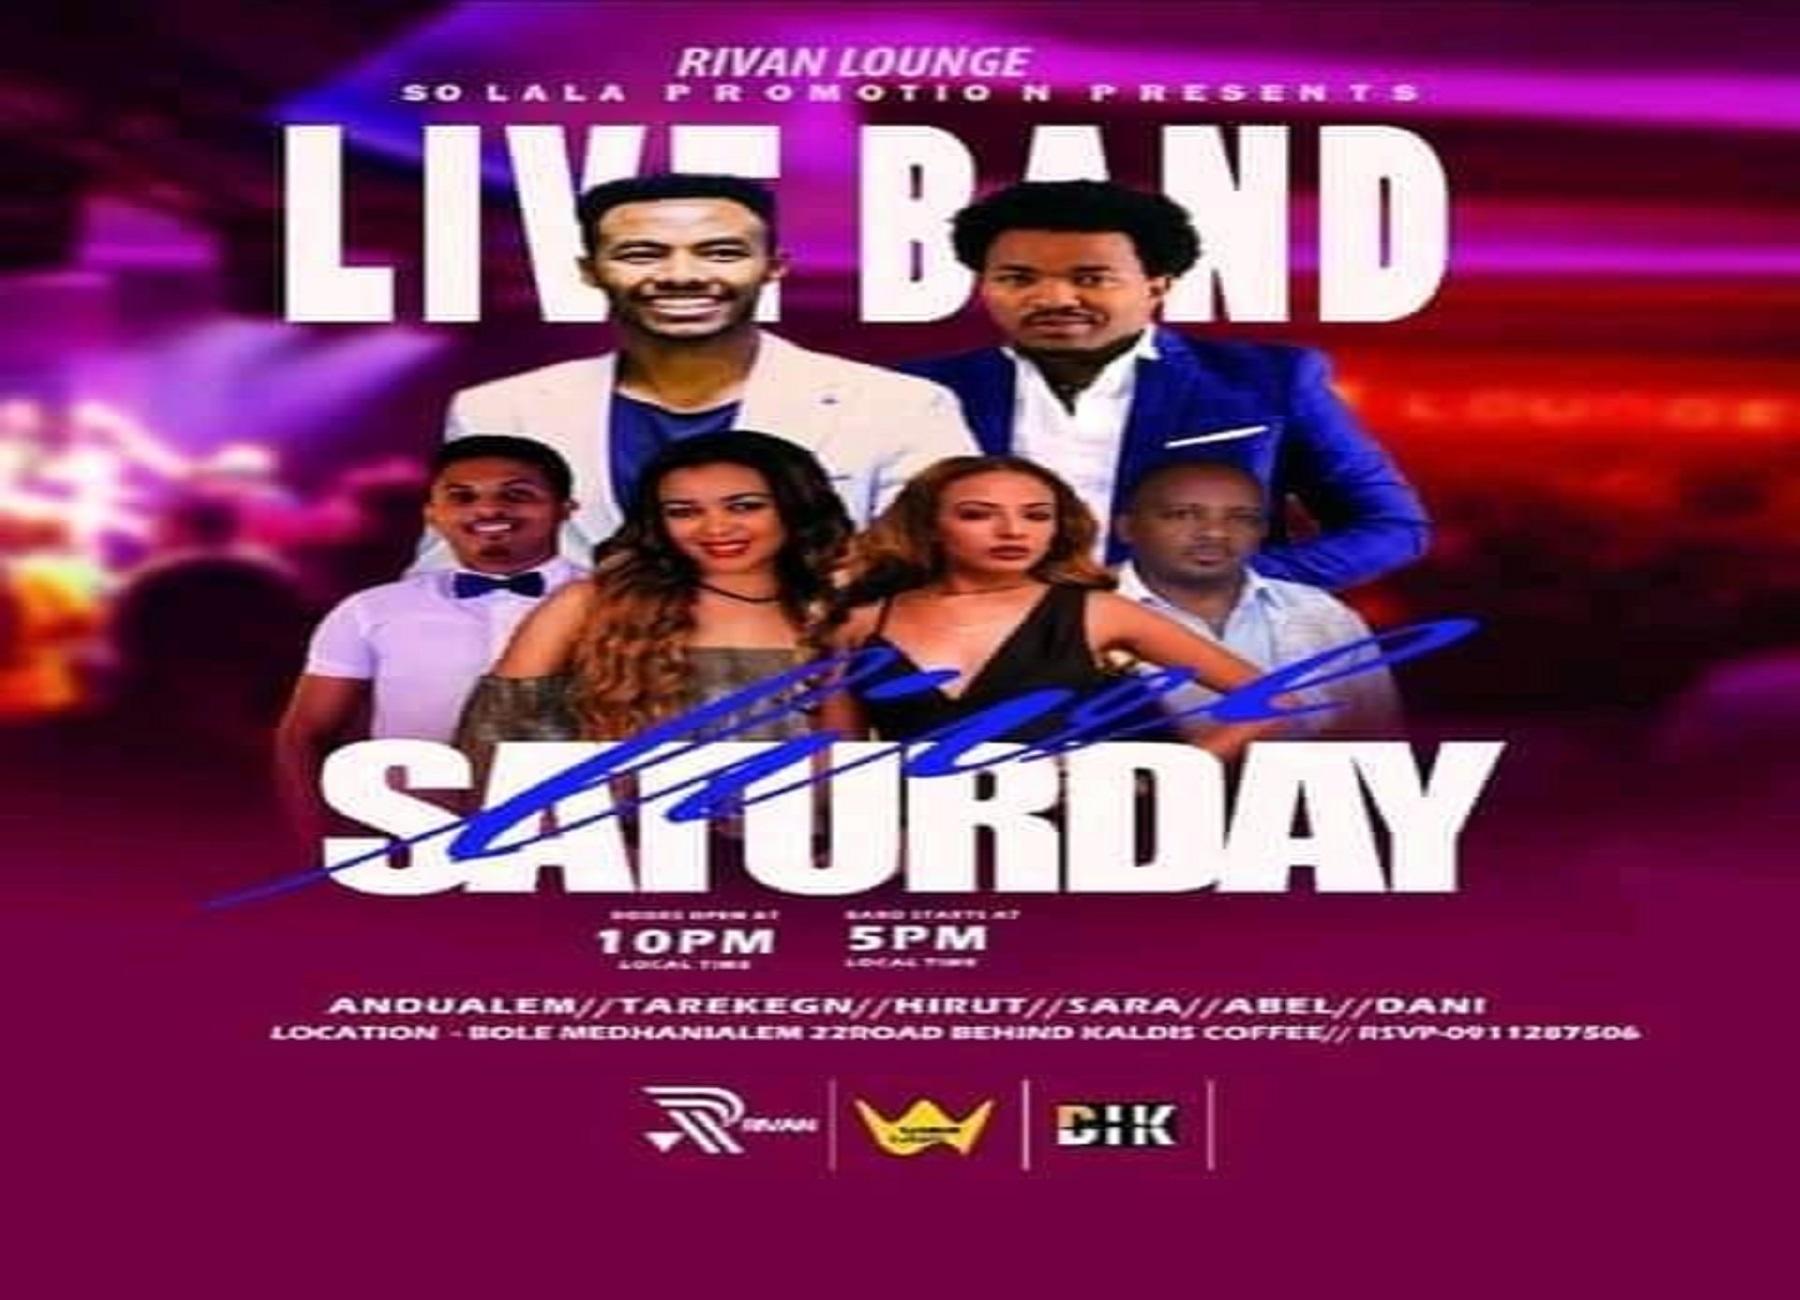 Saturday Live band